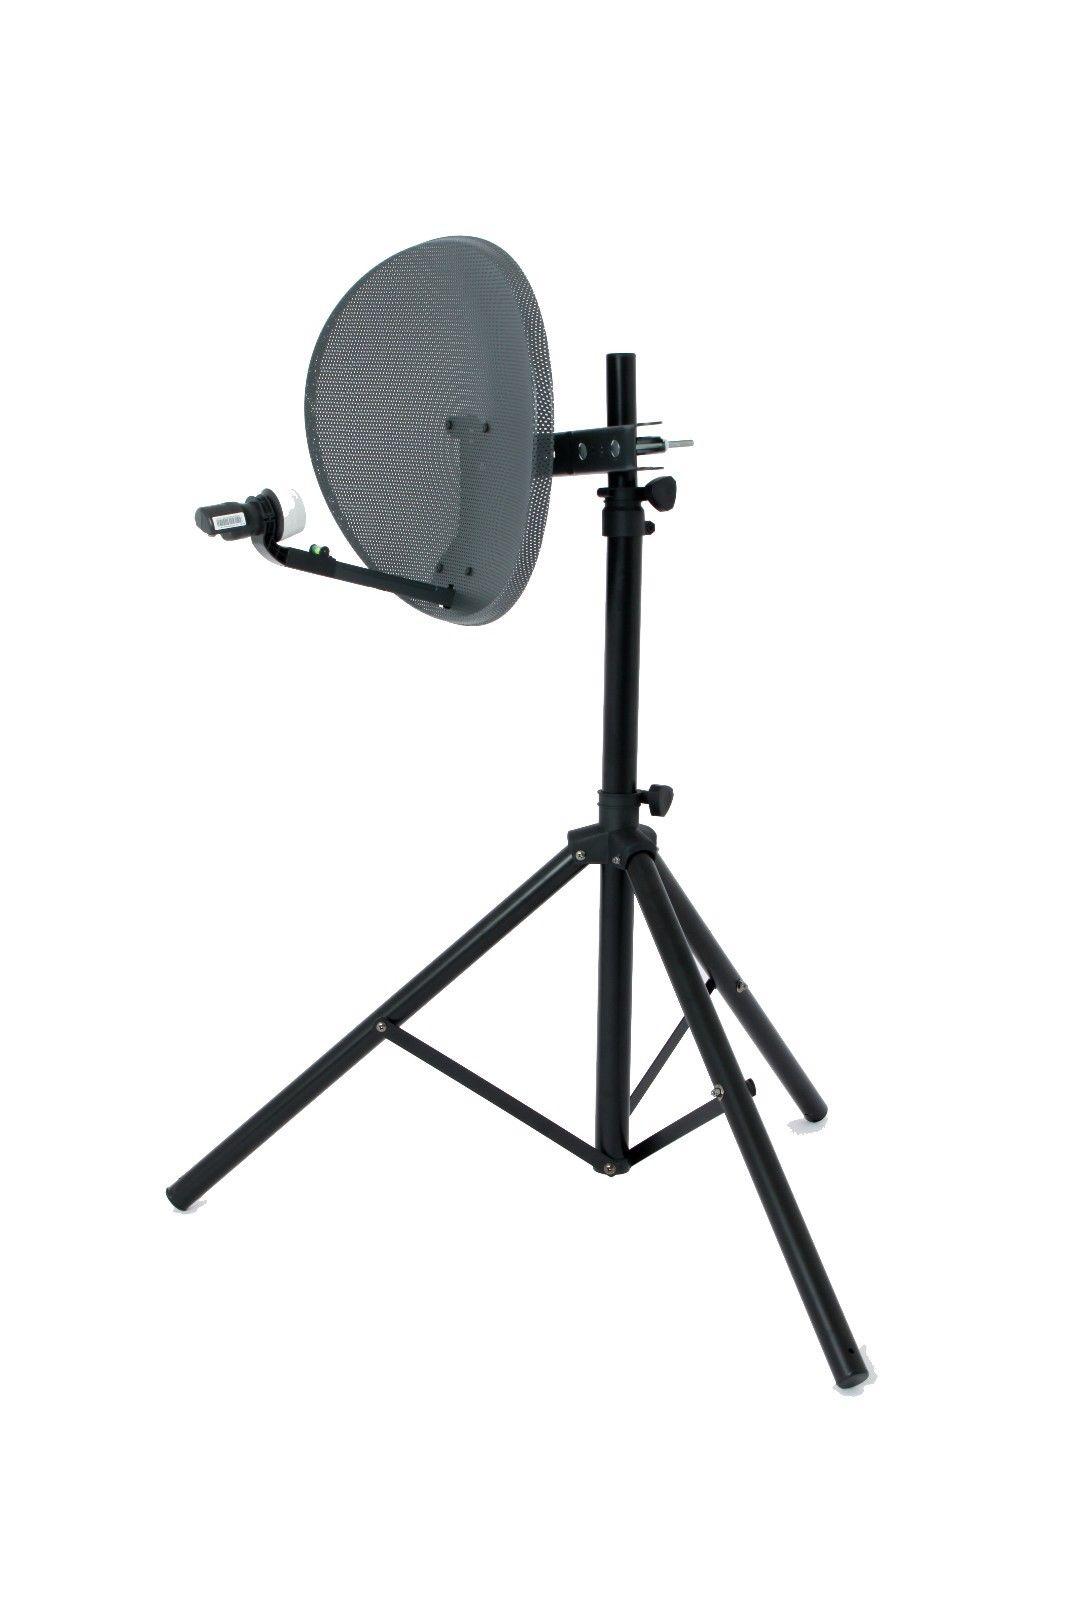 Diy Satellite Dish Tripod Diy Do It Your Self